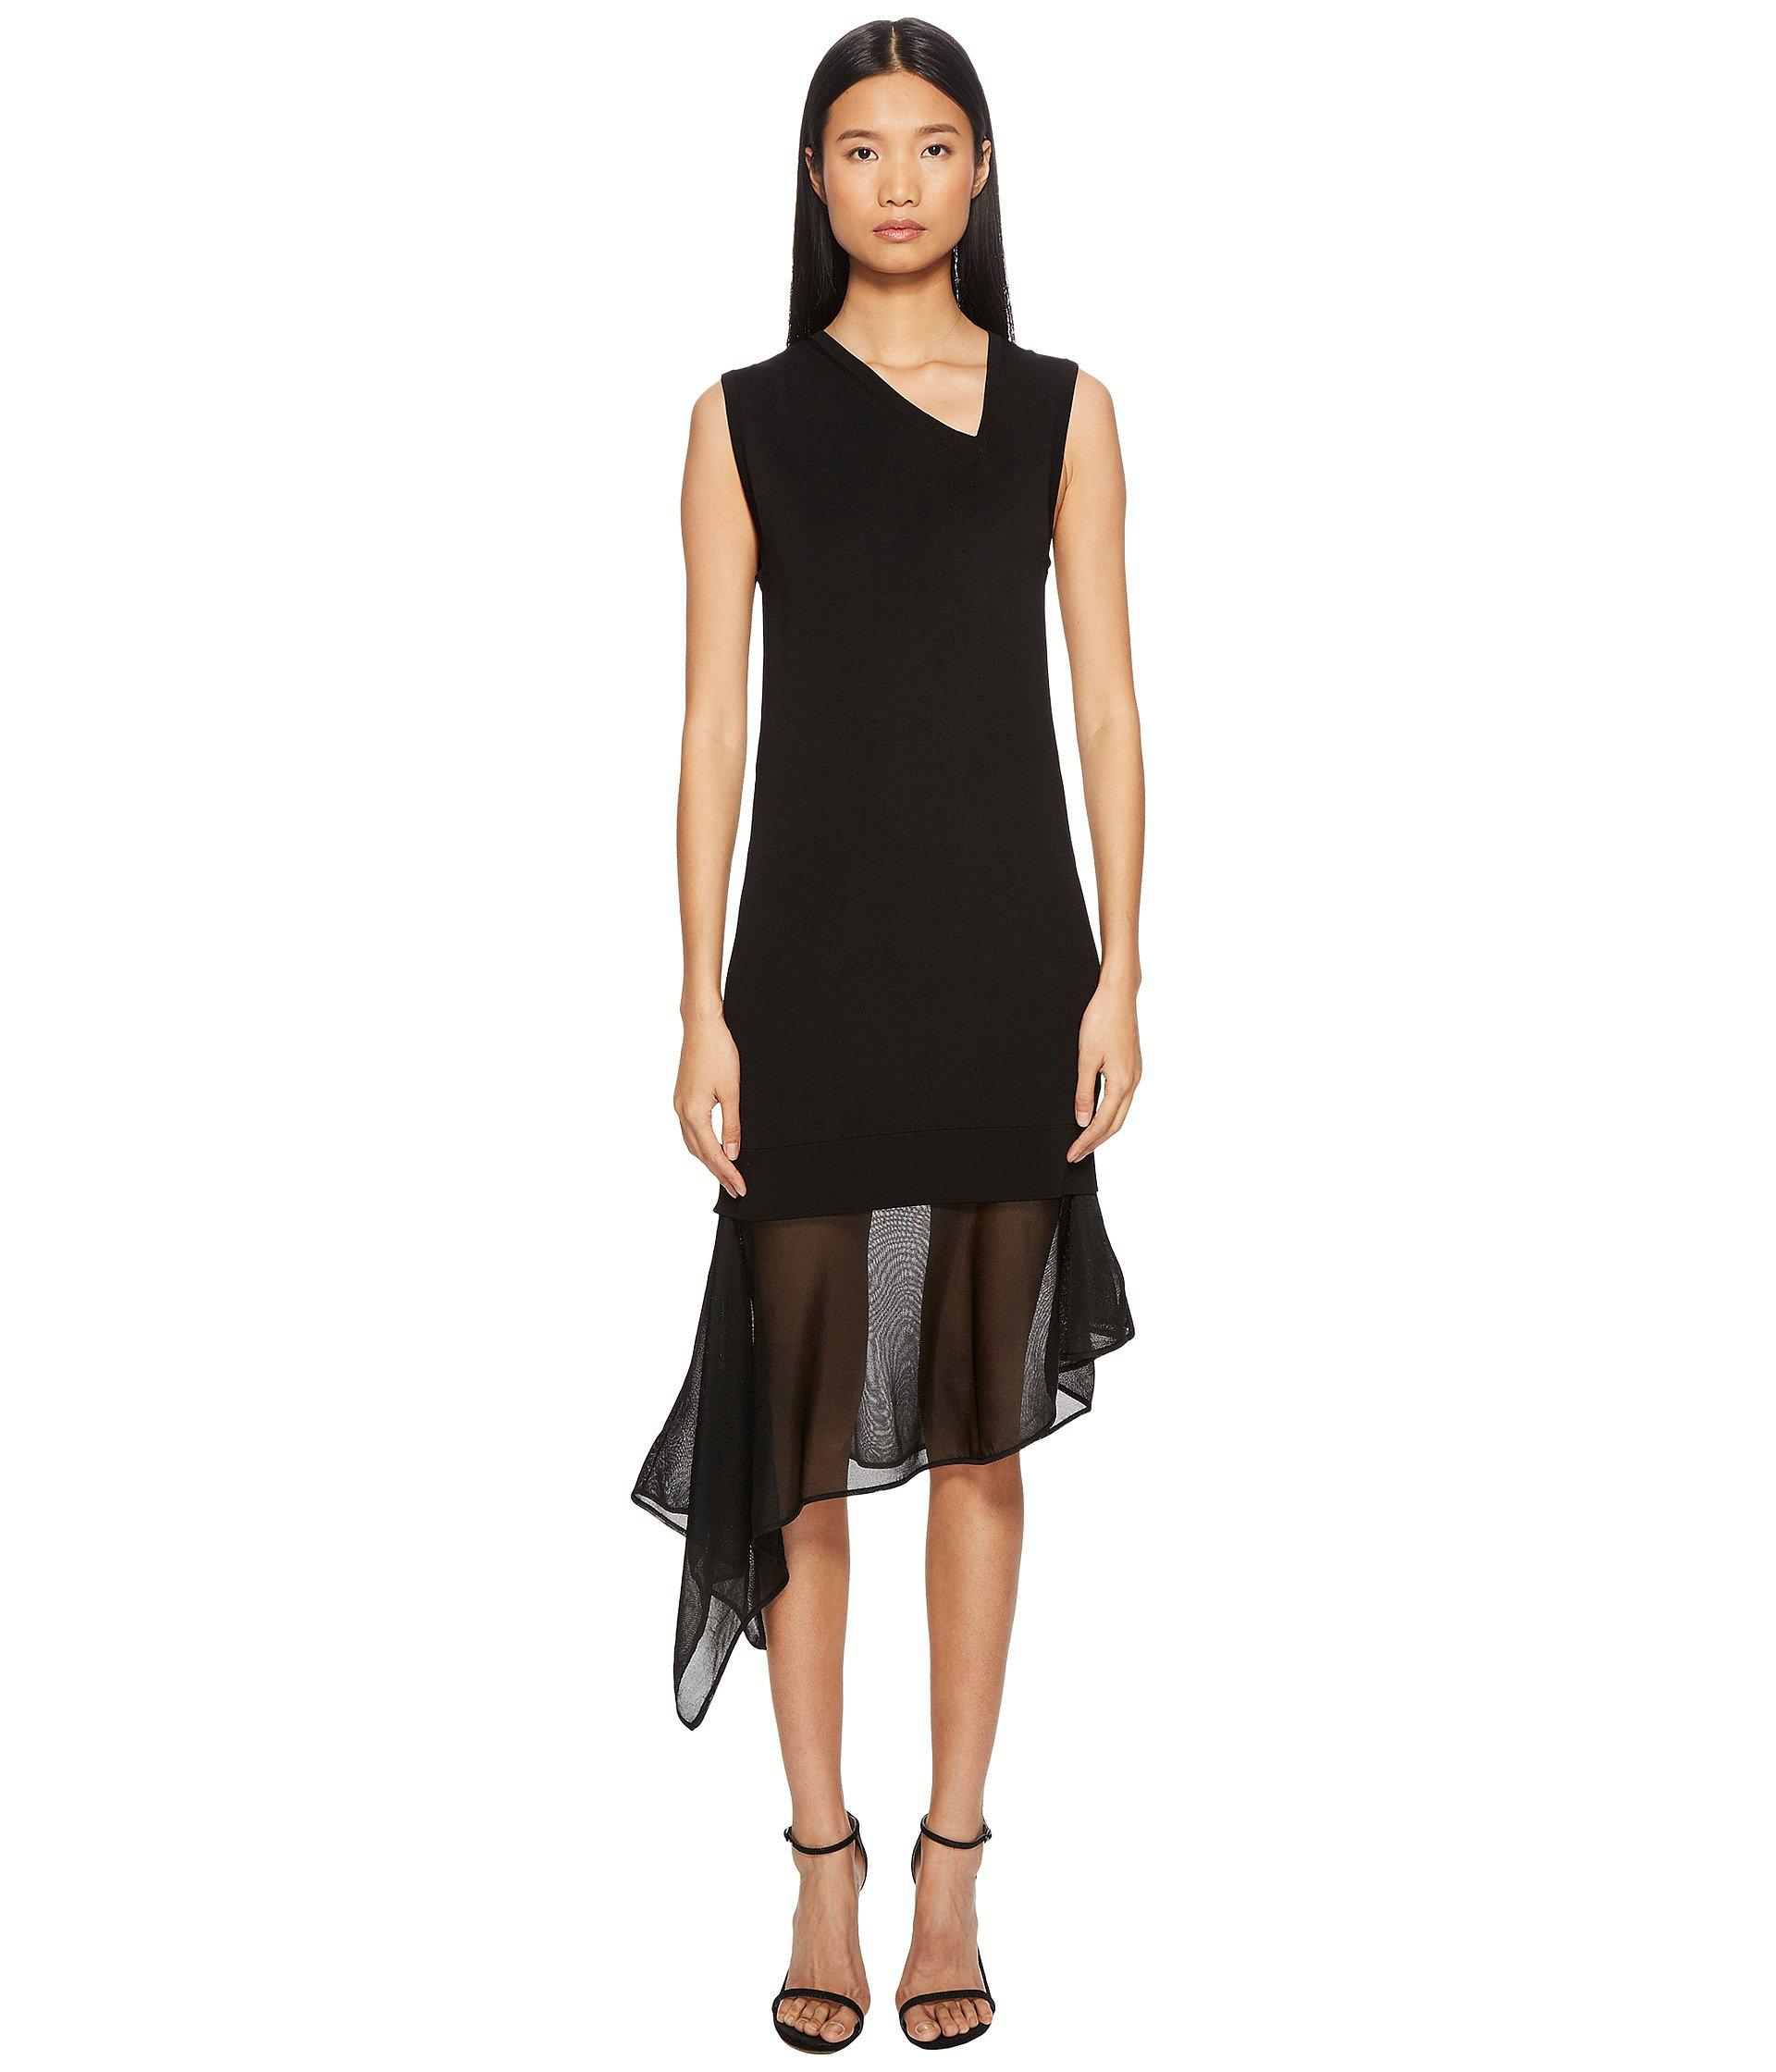 f2ea6cf5a3b Lyst - Neil Barrett Techno Knit Asymmetric Dress in Black - Save 55%